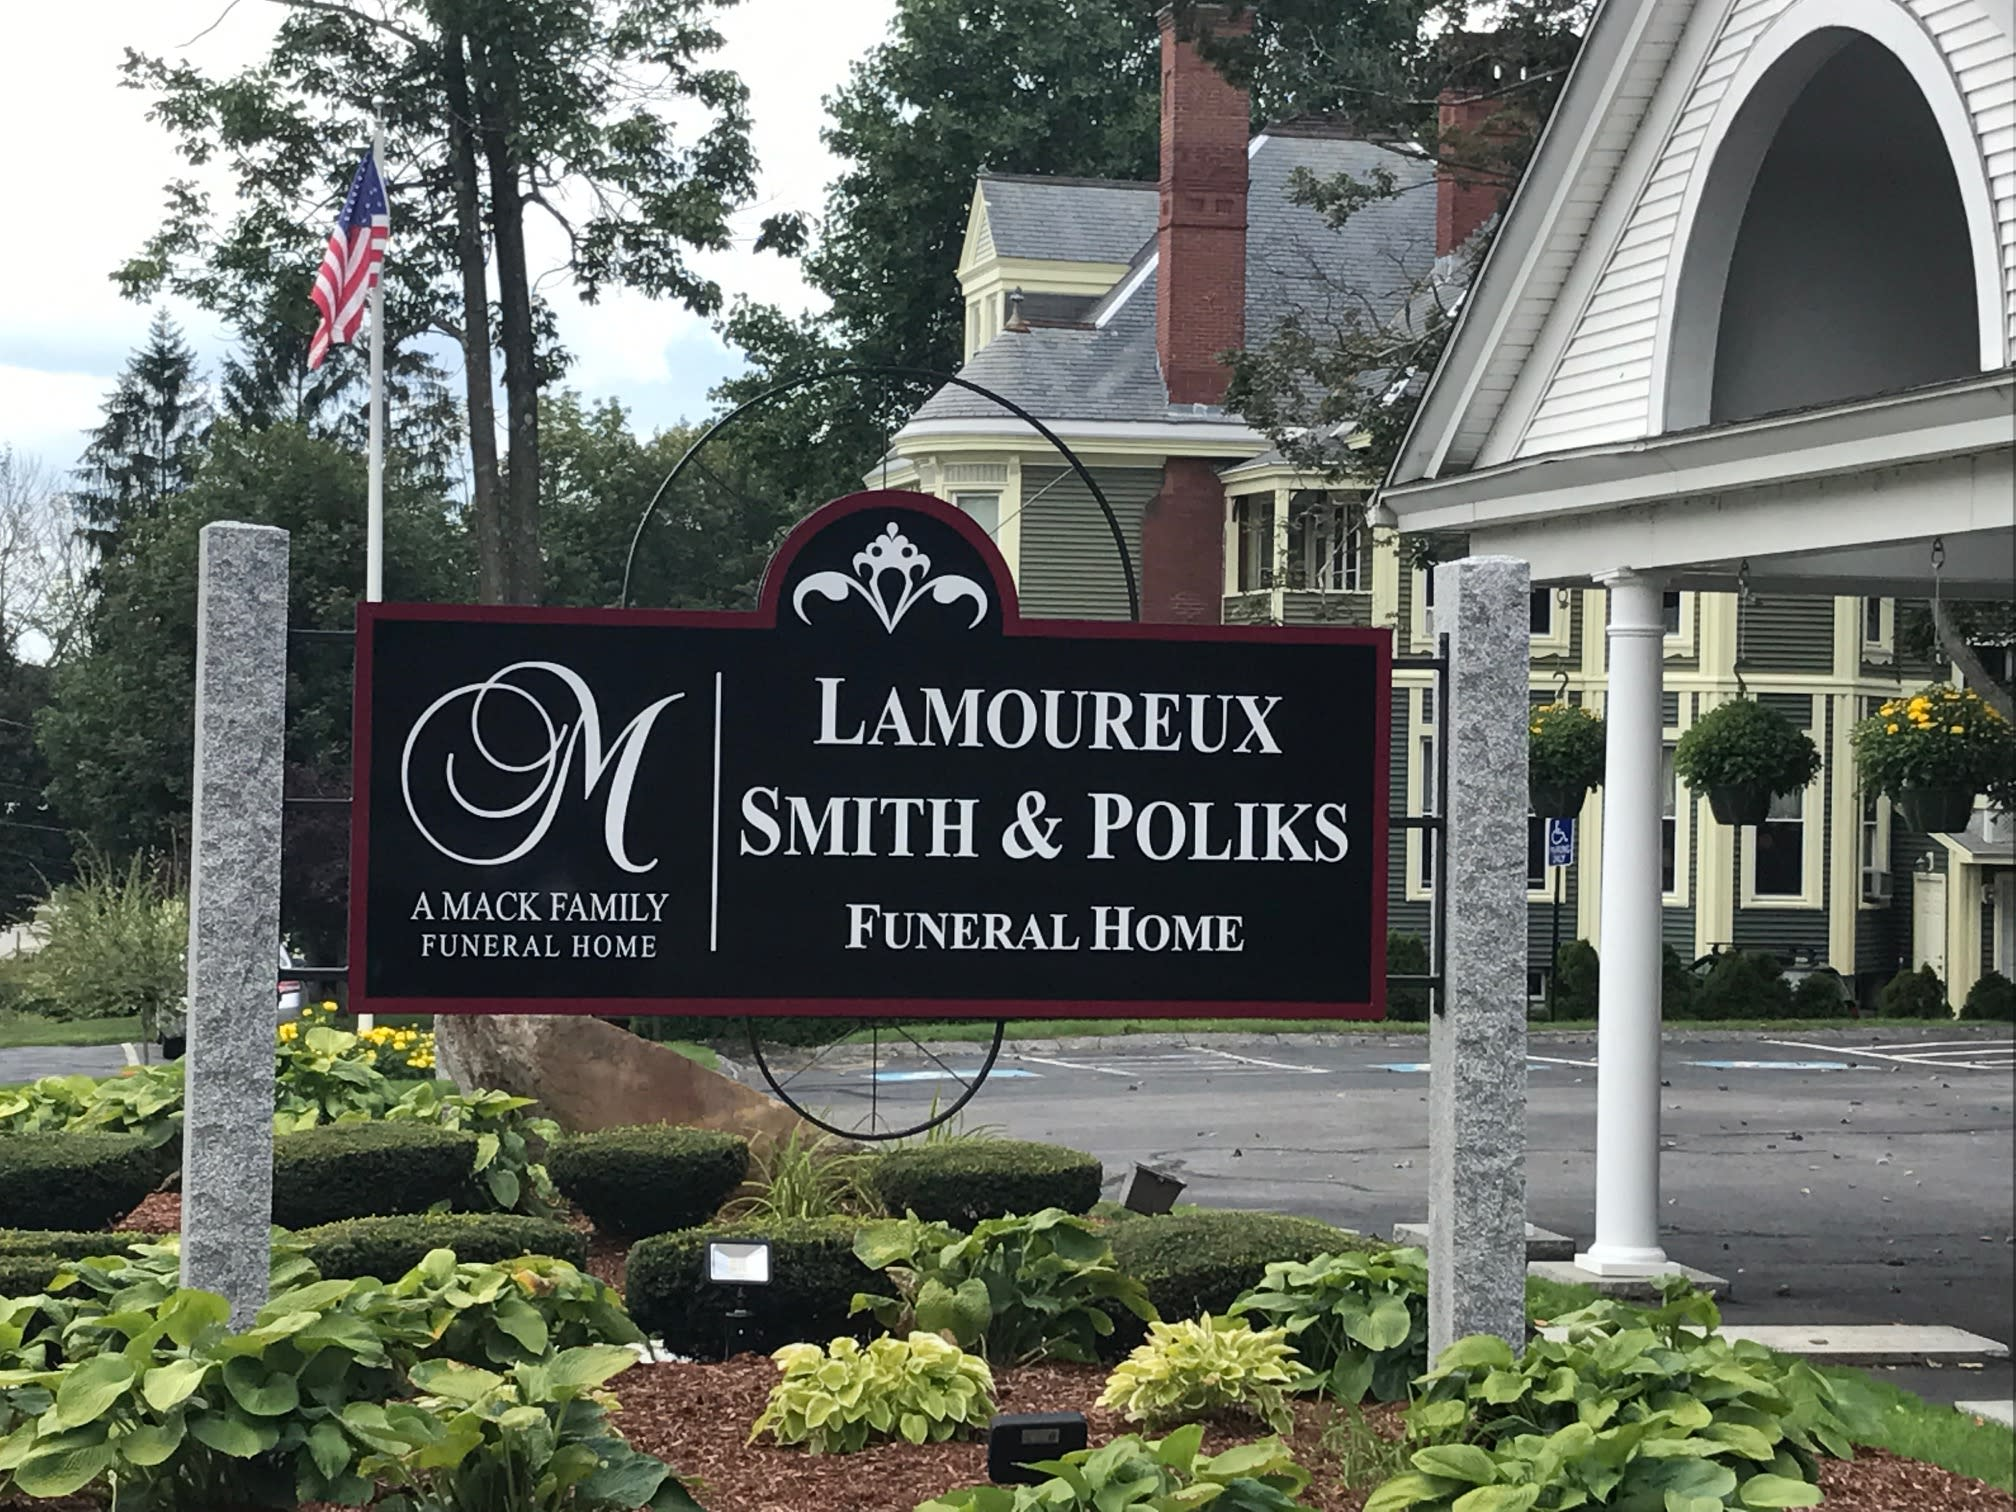 Mack Family Funeral Homes - Orange, MA